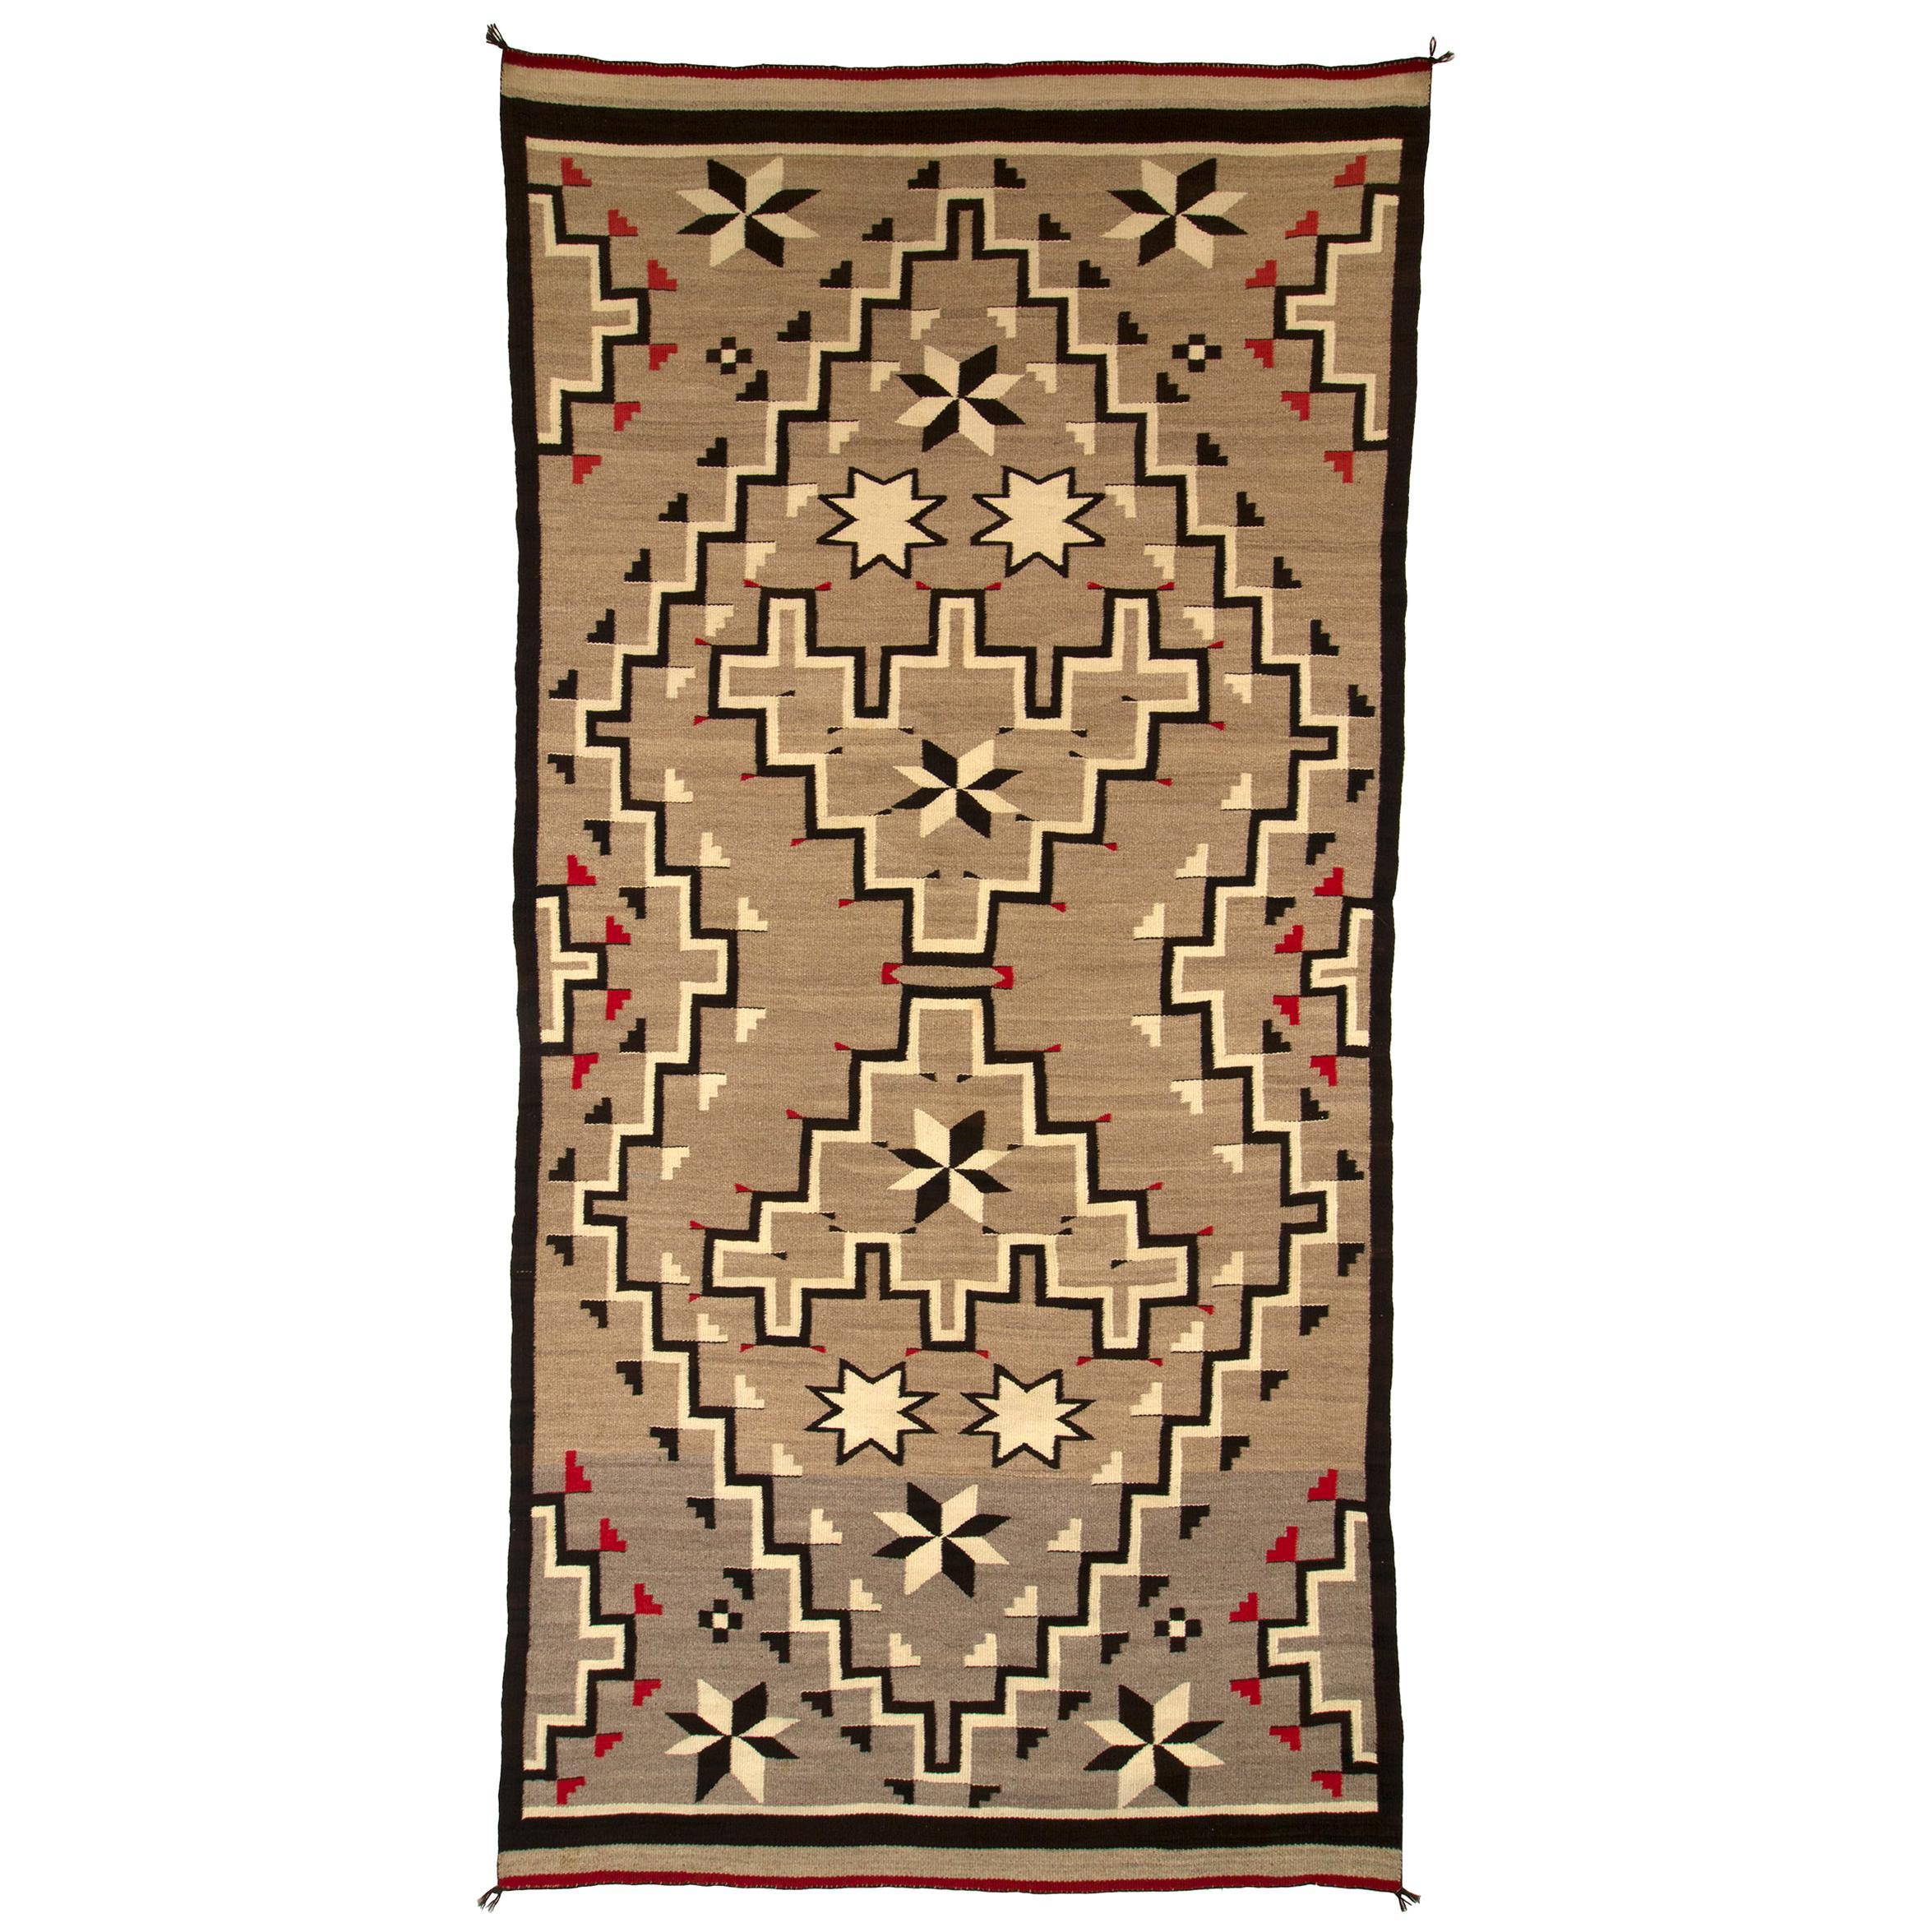 Navajo Rug, Vintage circa 1935 Trading Post Era Southwestern Weaving